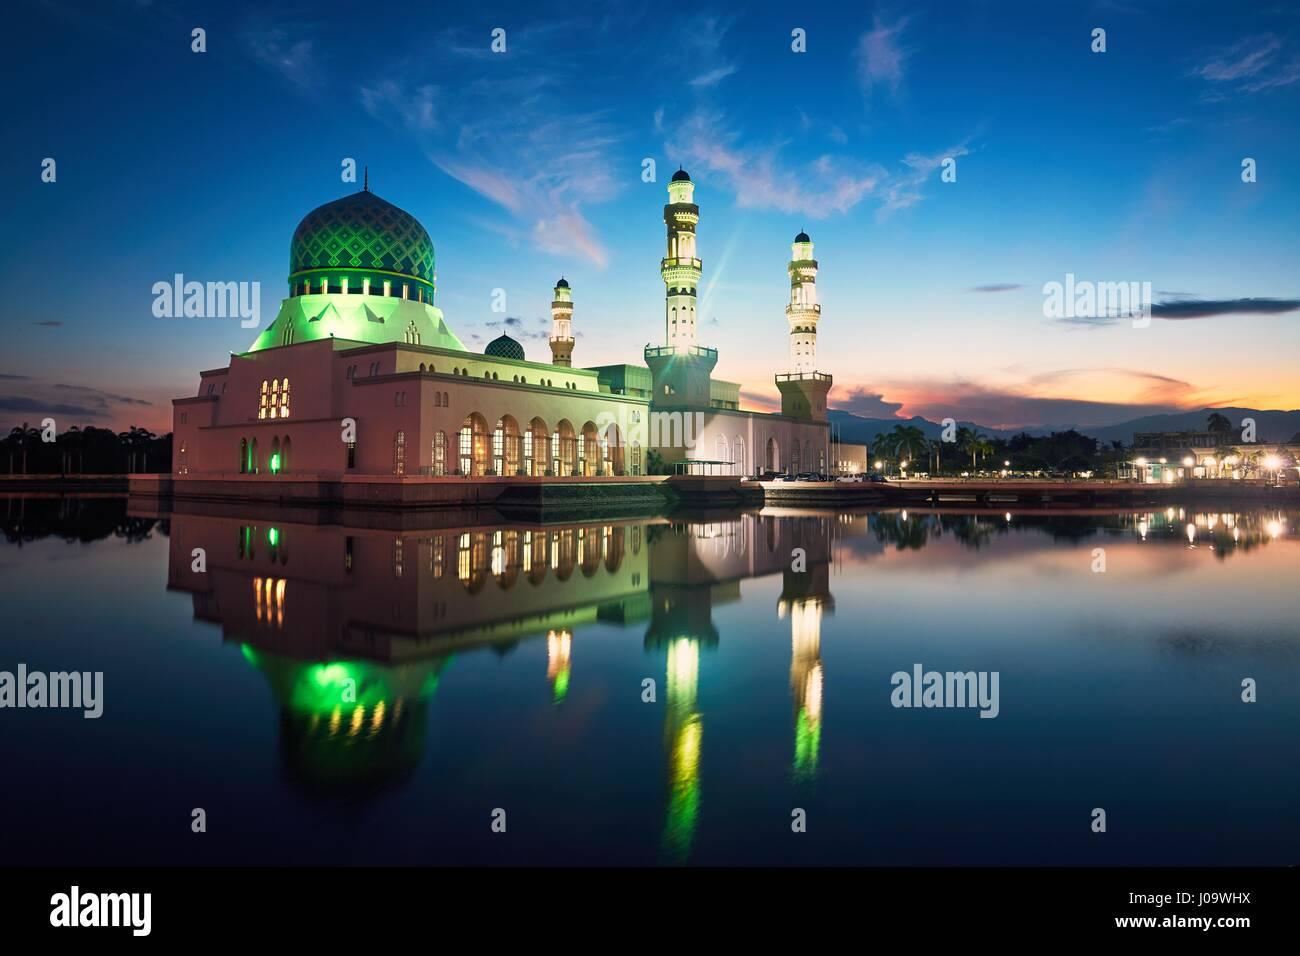 Reflection of Kota Kinabalu City Mosque, Island of Borneo, Malaysia Stock Photo